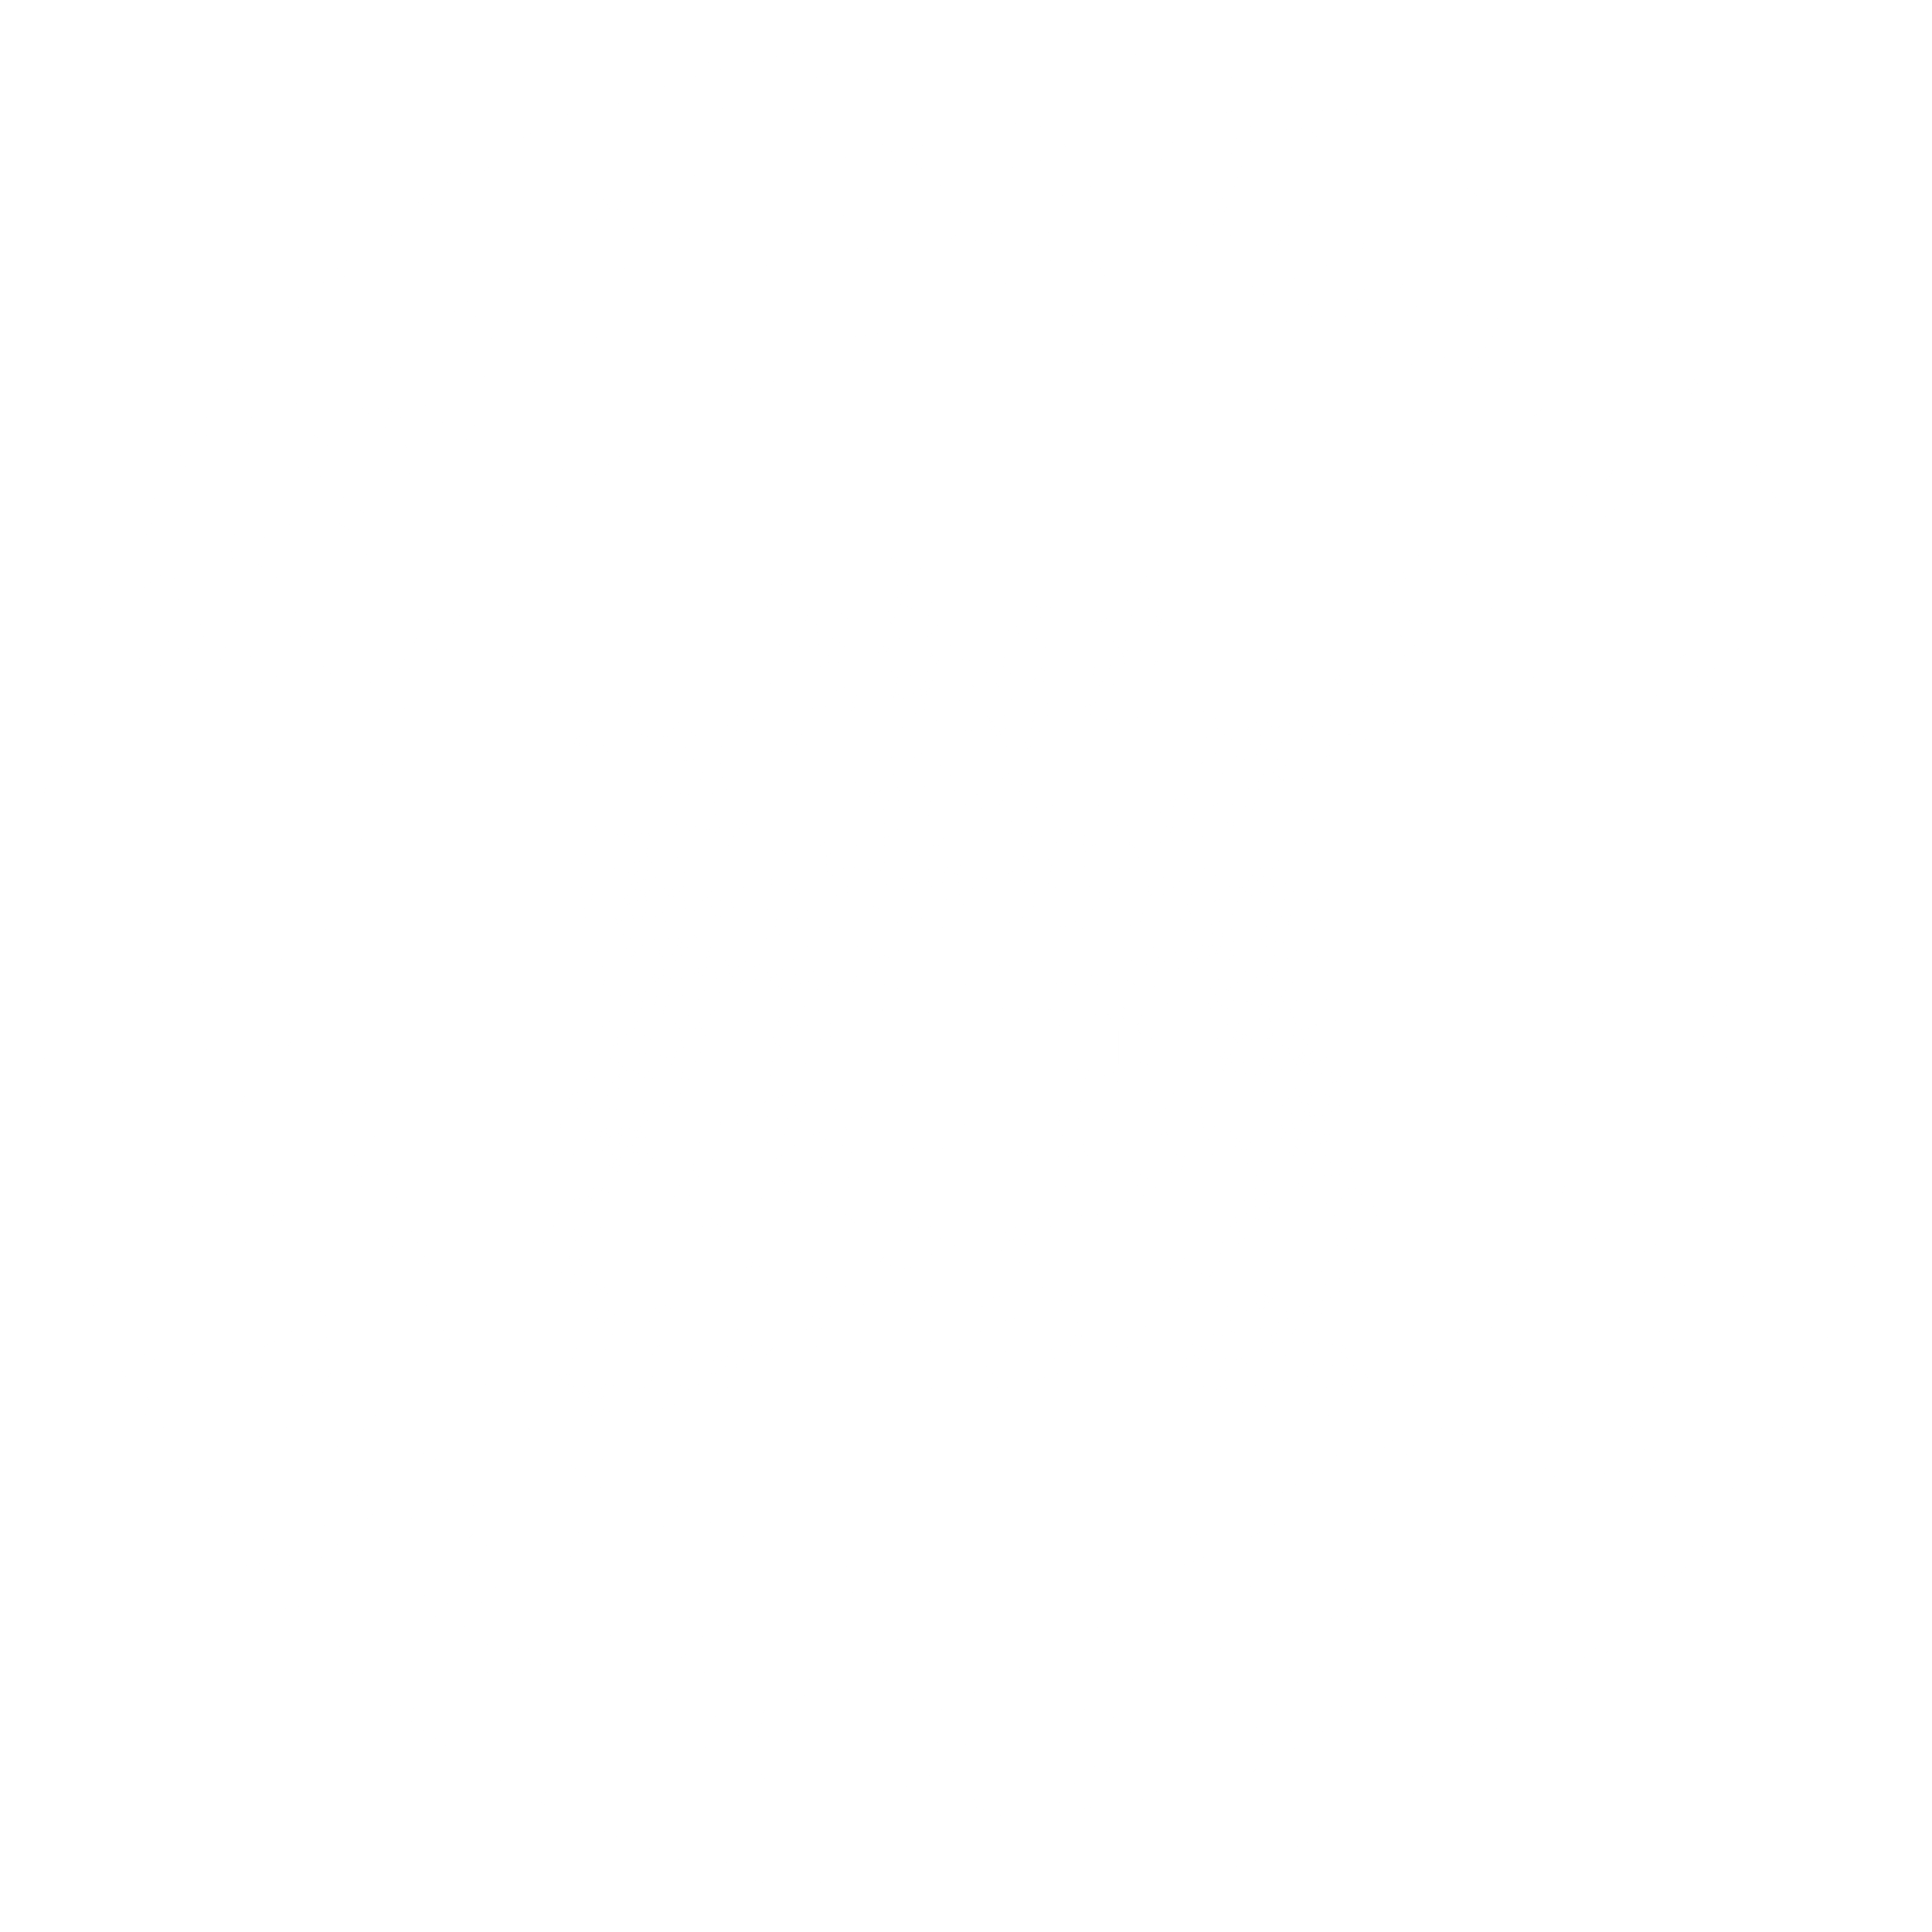 Hudson Bay Logo.Hudson S Bay Company Logo Png Transparent Svg Vector